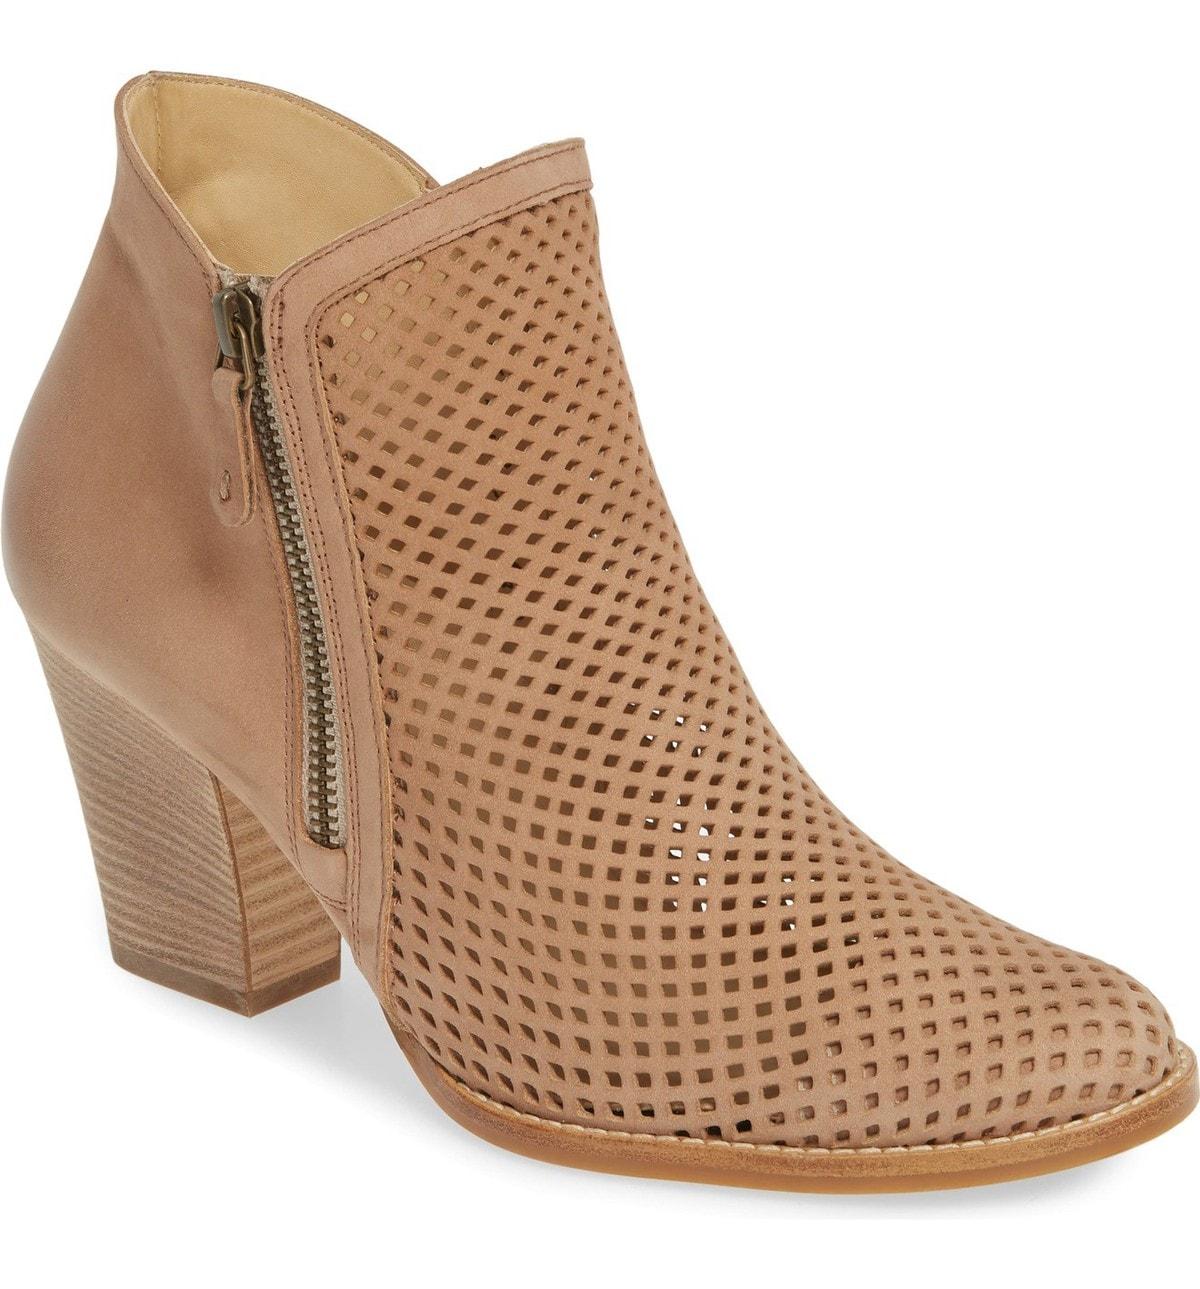 70e262ae1 Nordstrom Anniversary Sale: best women's shoes!! - Mint Arrow